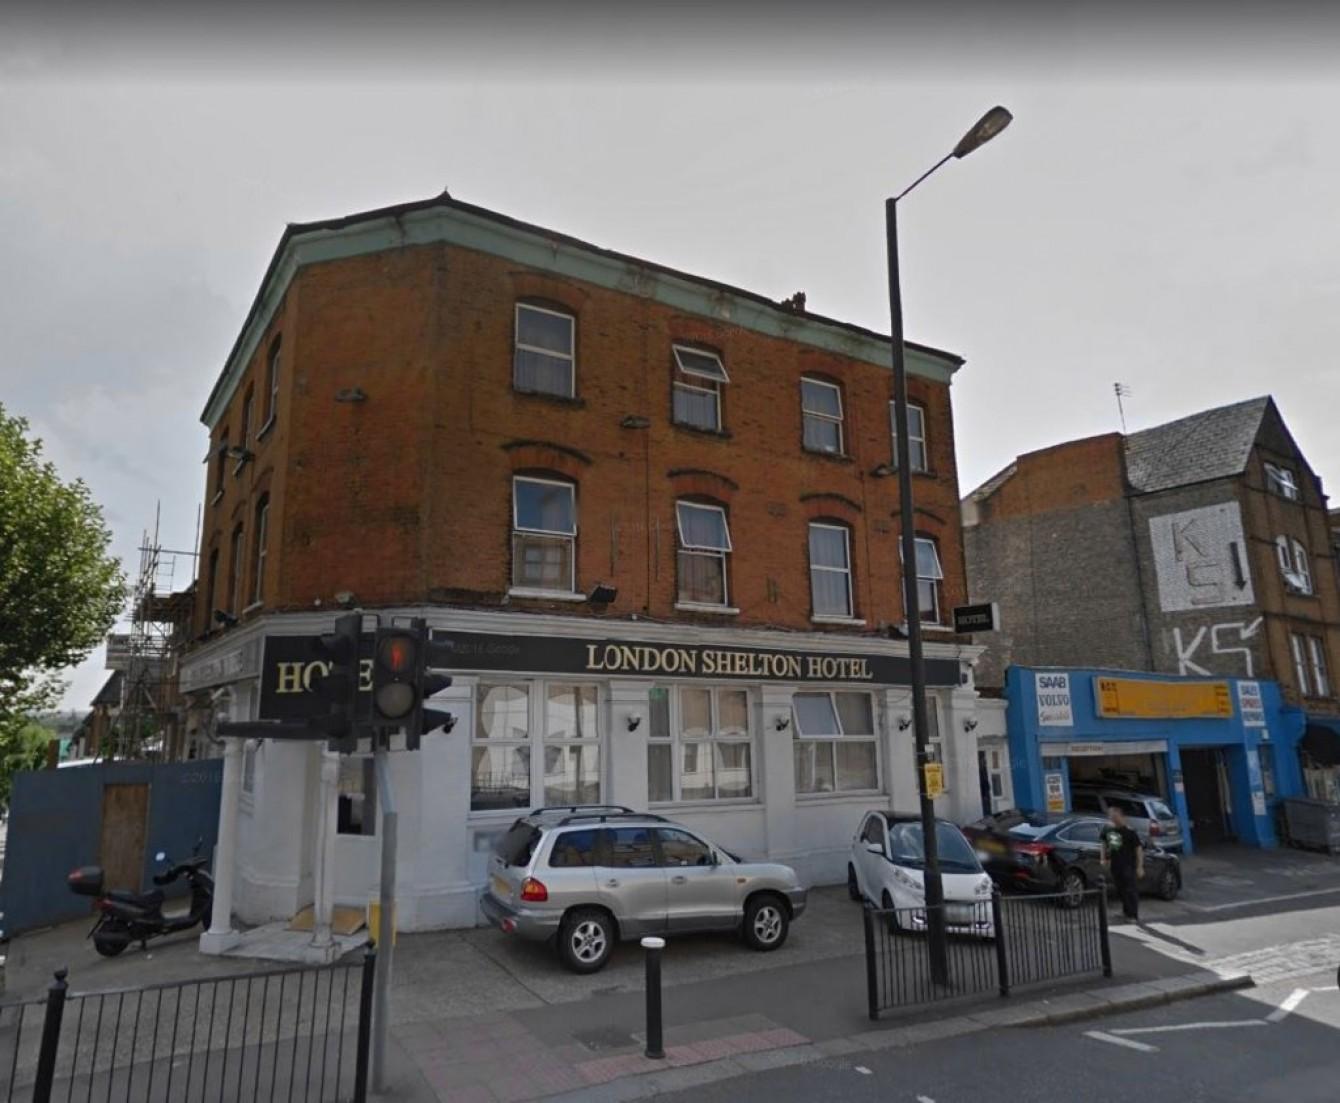 Images for Wightman Road, Haringey, London EAID:c8d5f0ae42d594d169bca90f3b8b041a BID:1